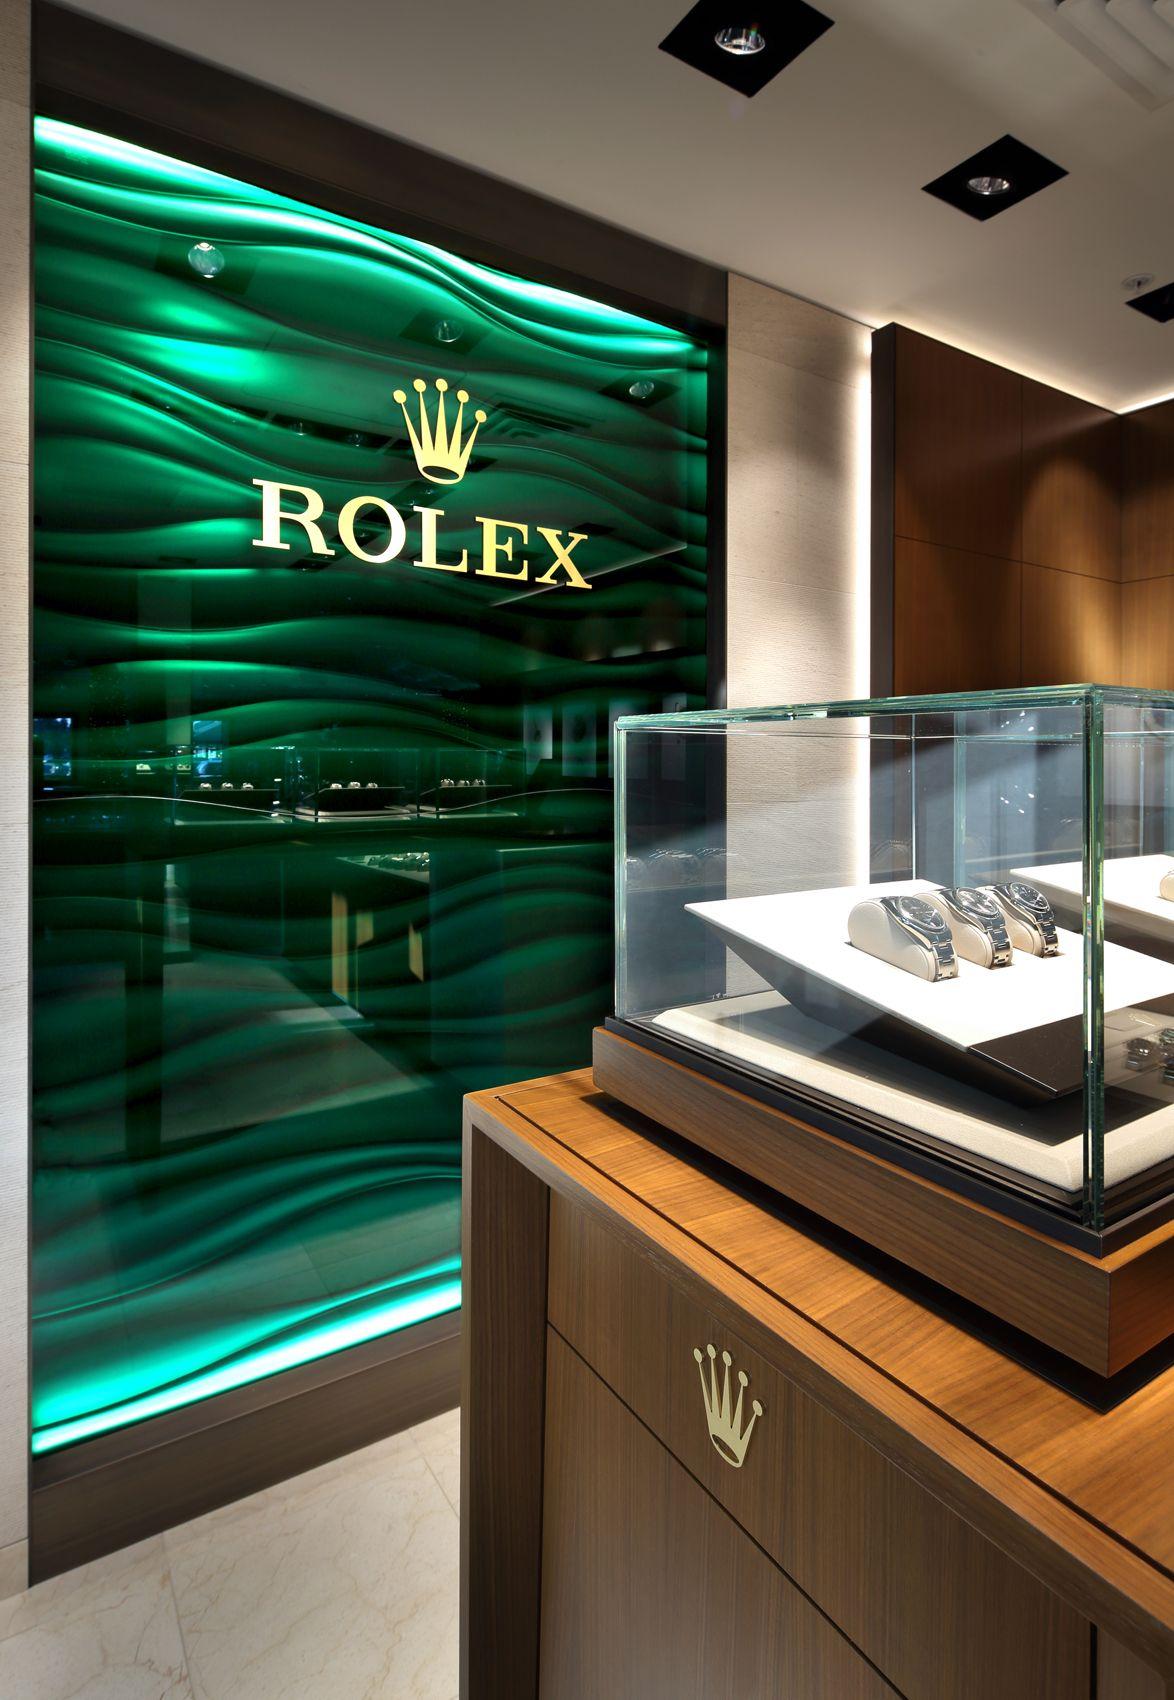 DaVons_Rolex_3.jpg